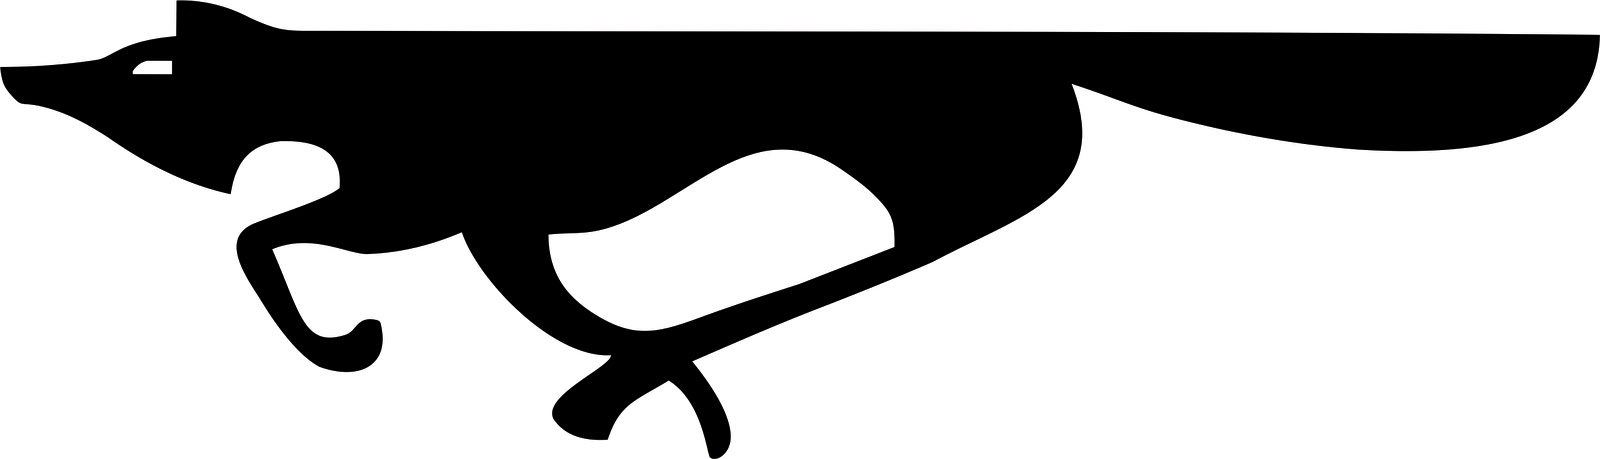 Adesivo Para Geladeira De Kombi ~ Brindik Adesivos